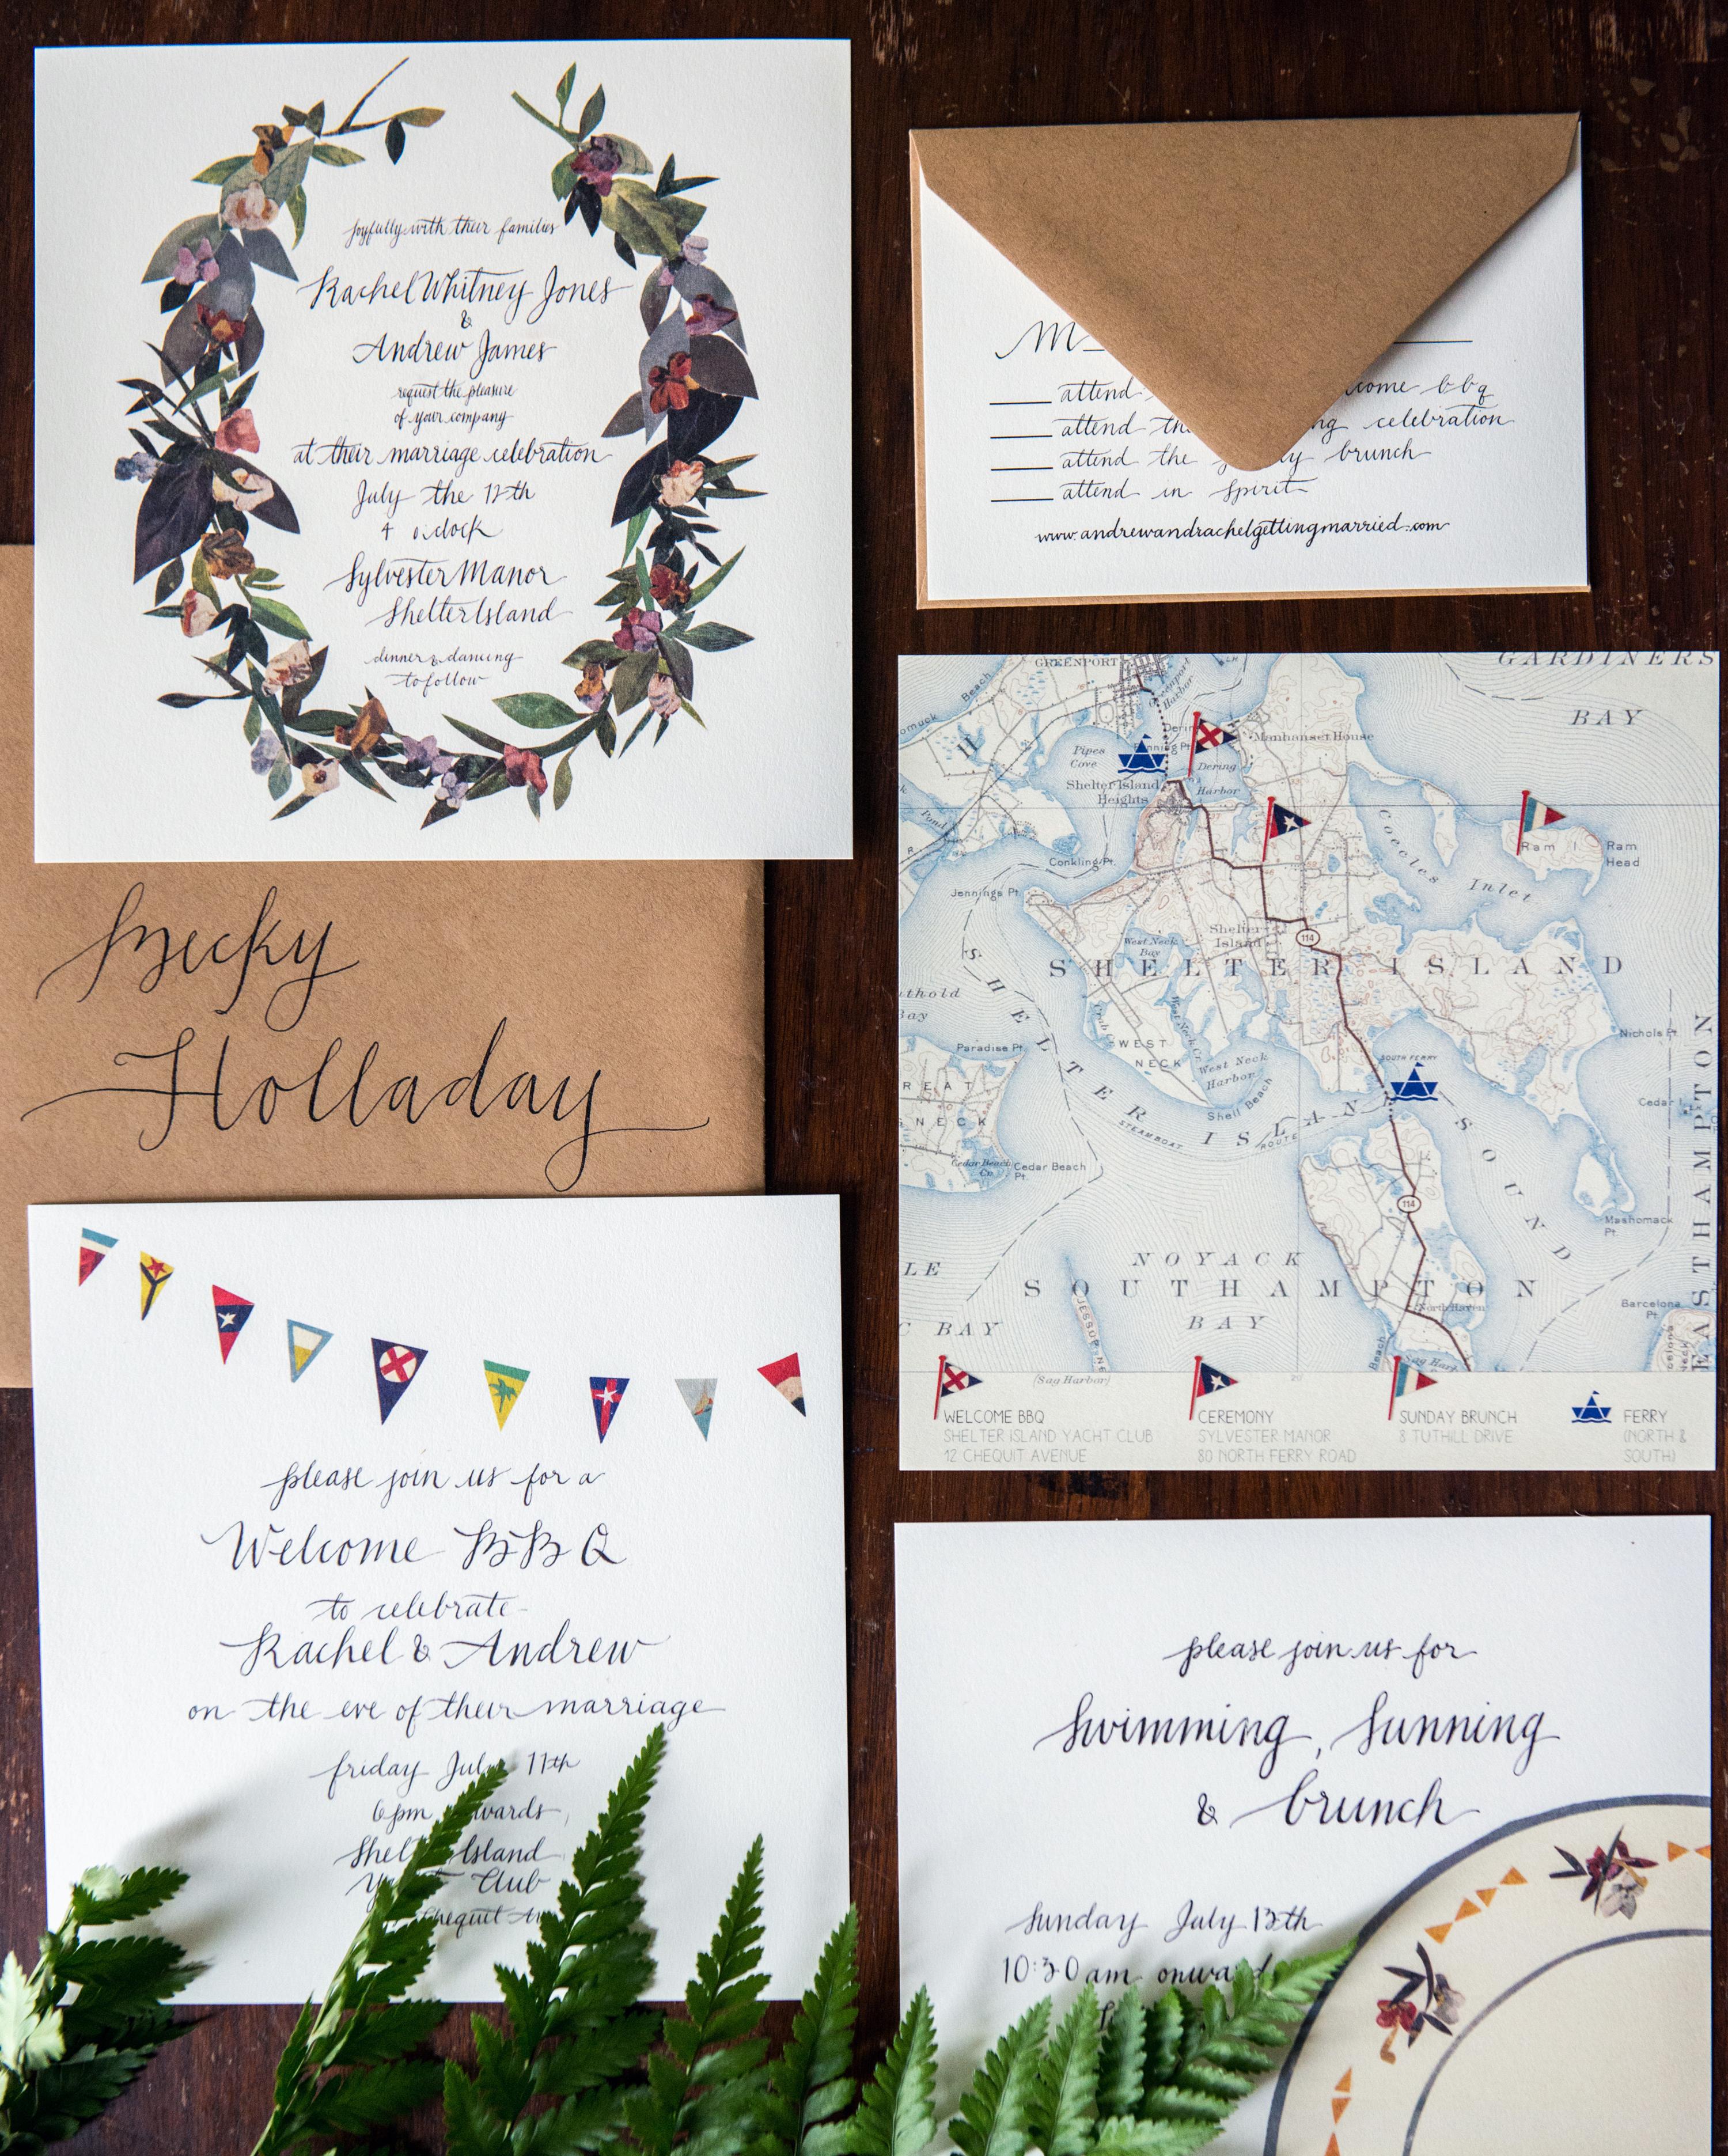 rachel-andrew-wedding-stationery-008-s112195-0915.jpg